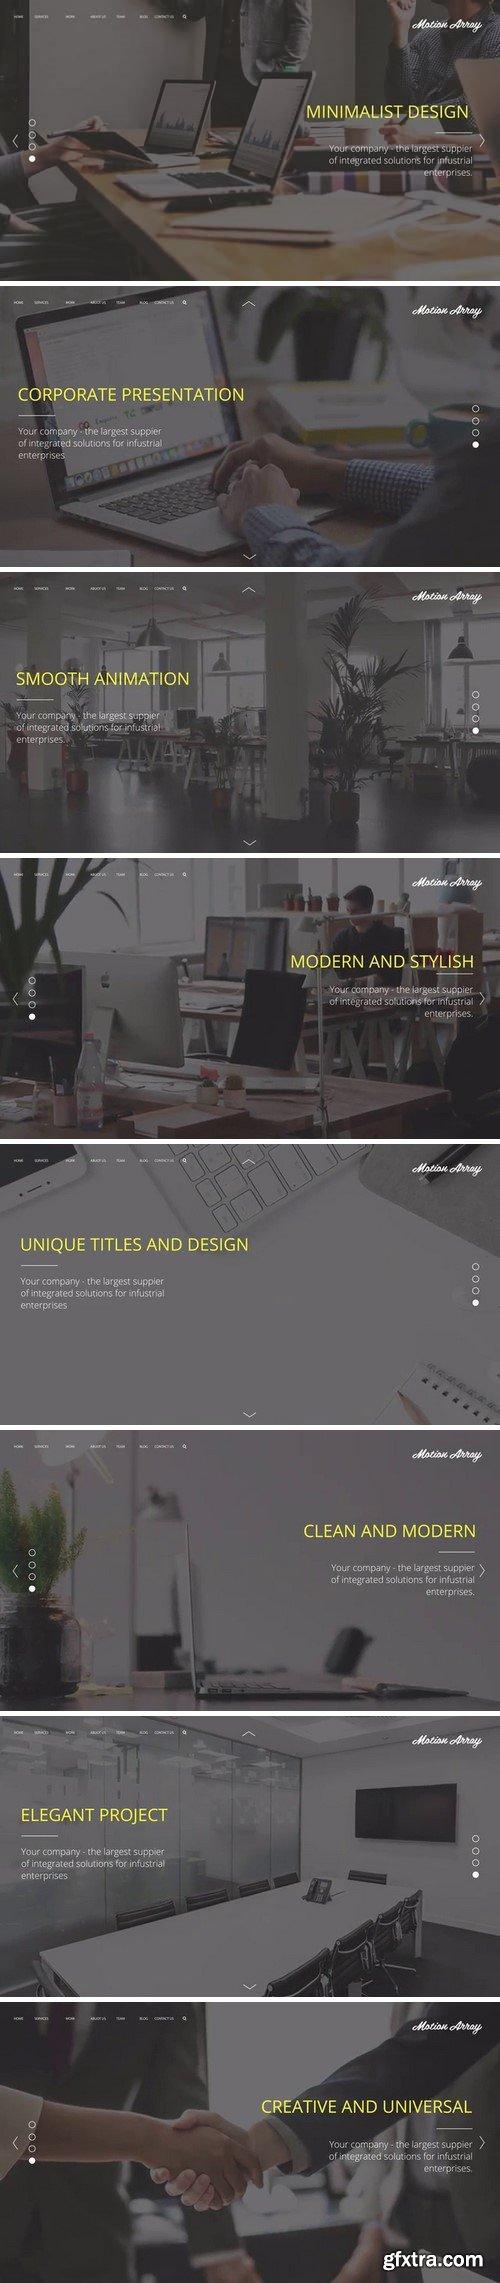 MotionArray Minimalism Corporate Presentation 165058